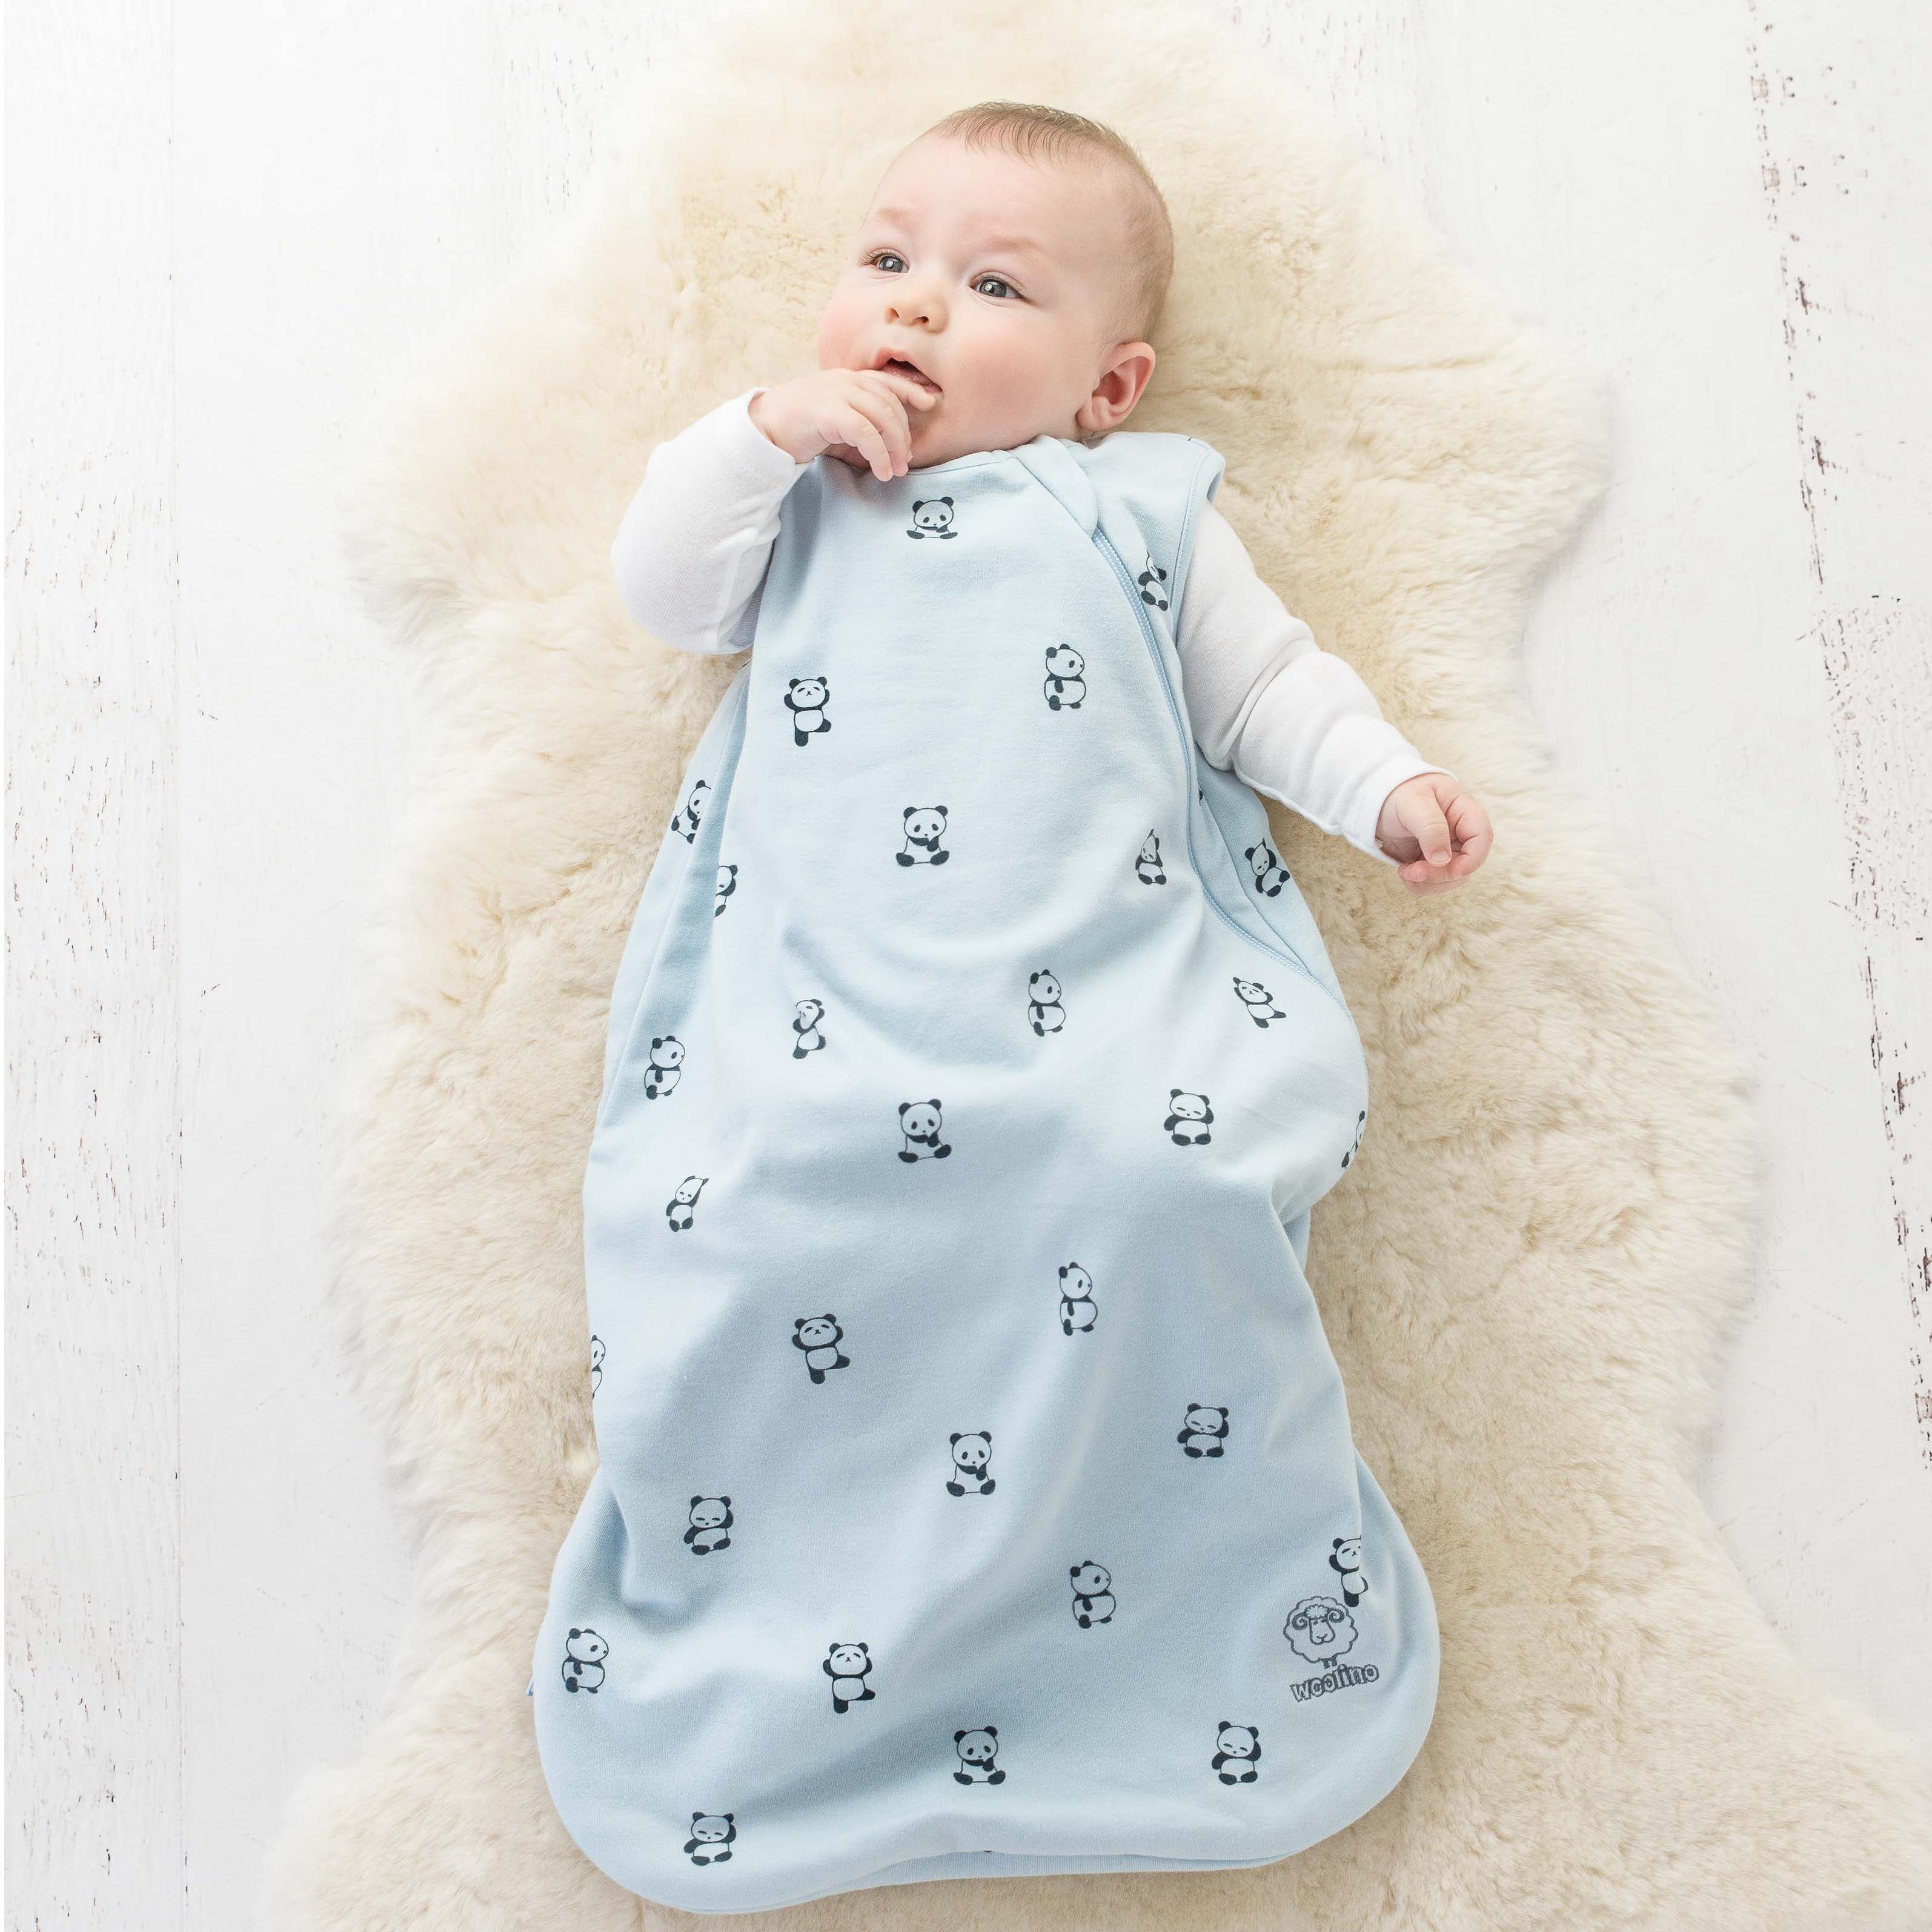 7076b84c7efb Woolino sleep sack made of the finest merino wool and organic cotton ...